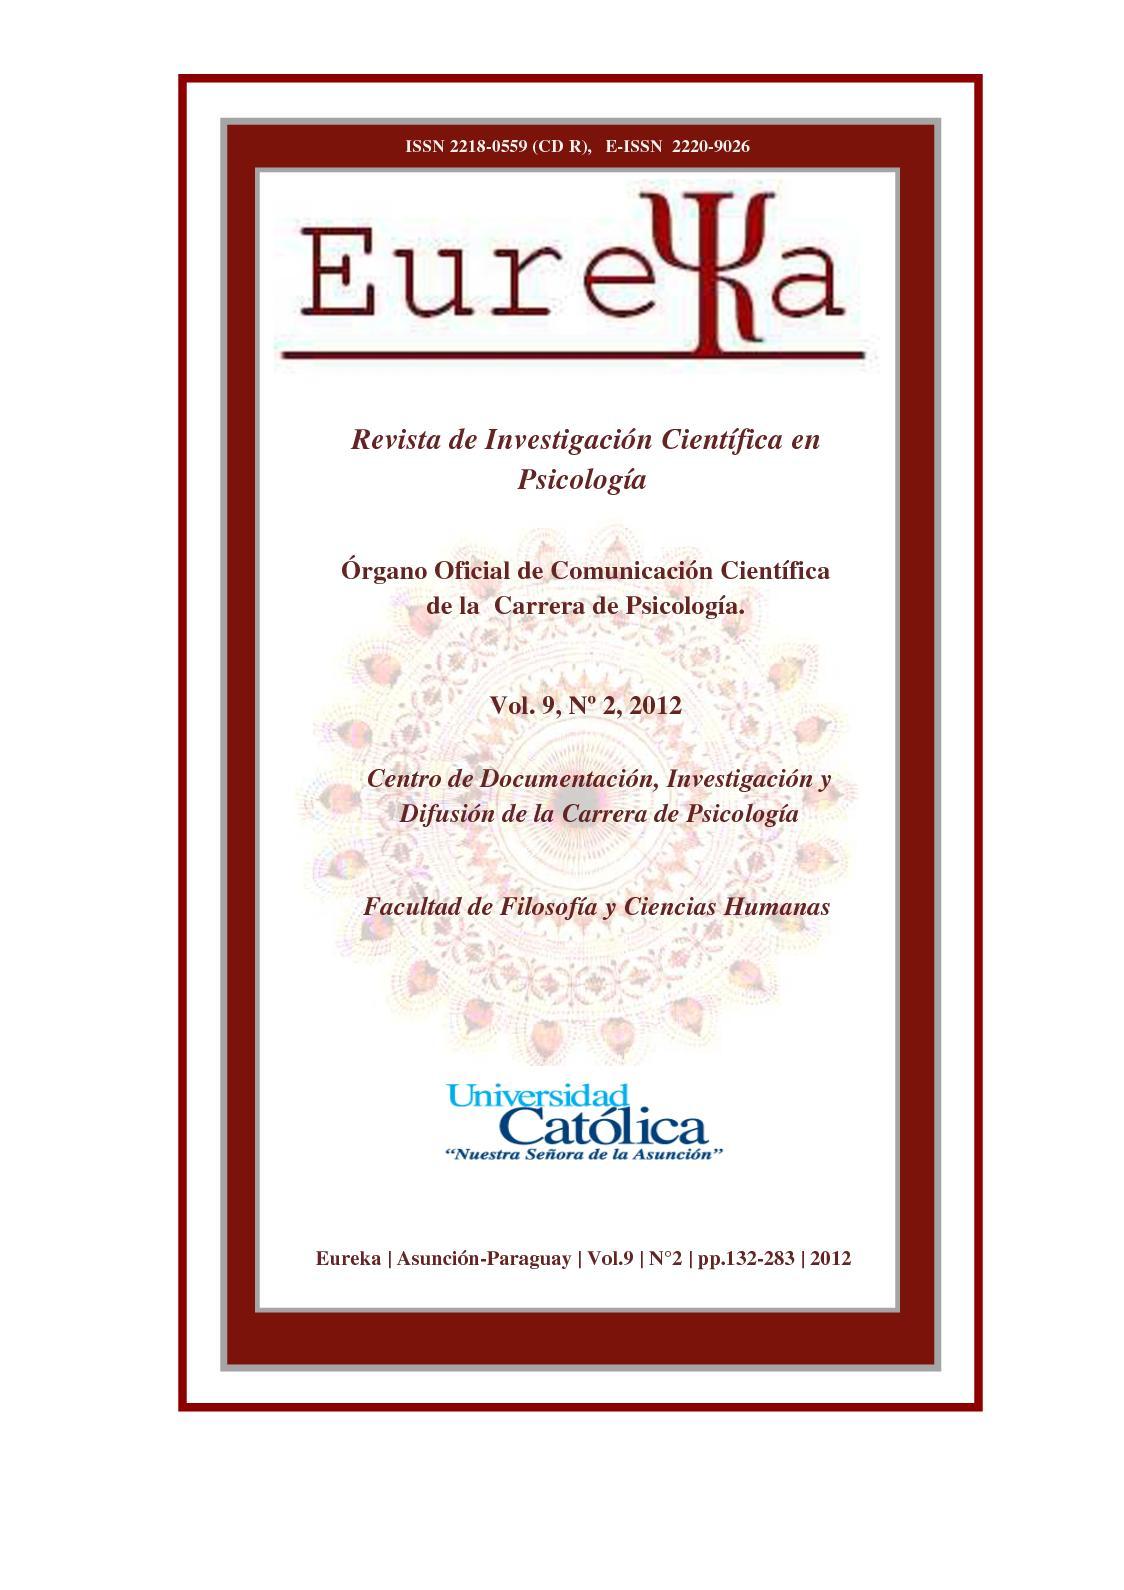 Calaméo - Eureka - Revista Psicología